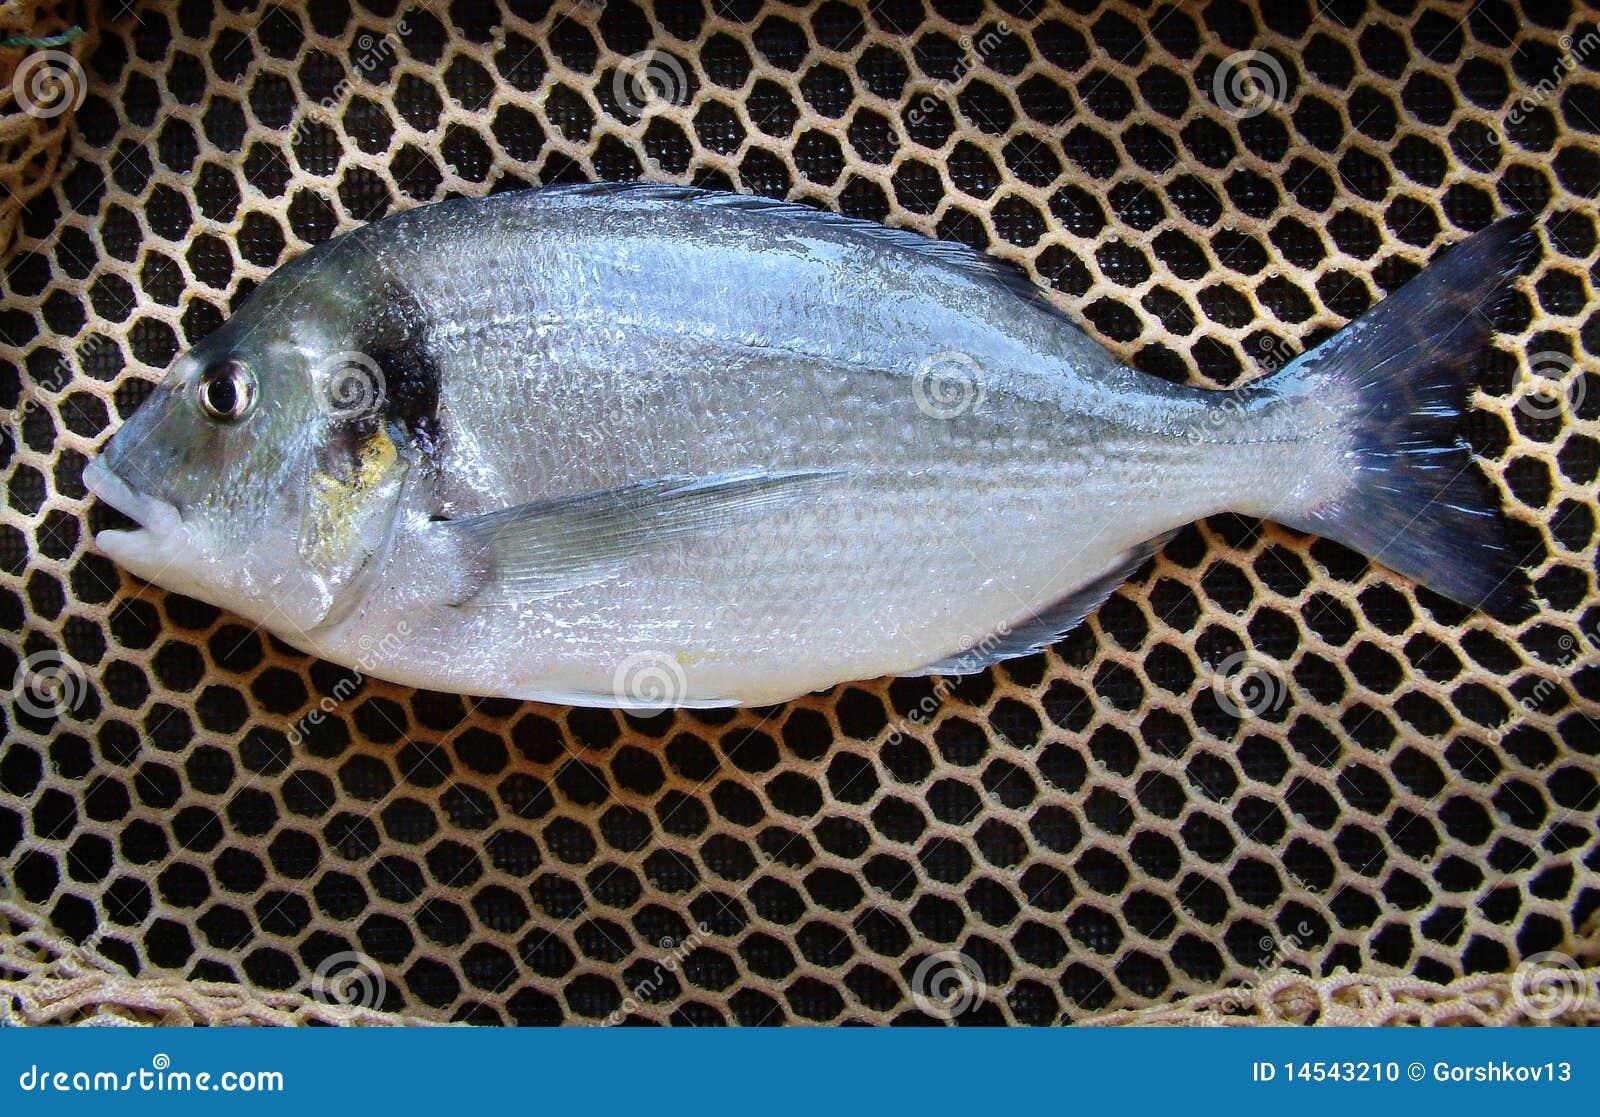 Dorade popular marine cultured fish stock photo image for Popular saltwater fish